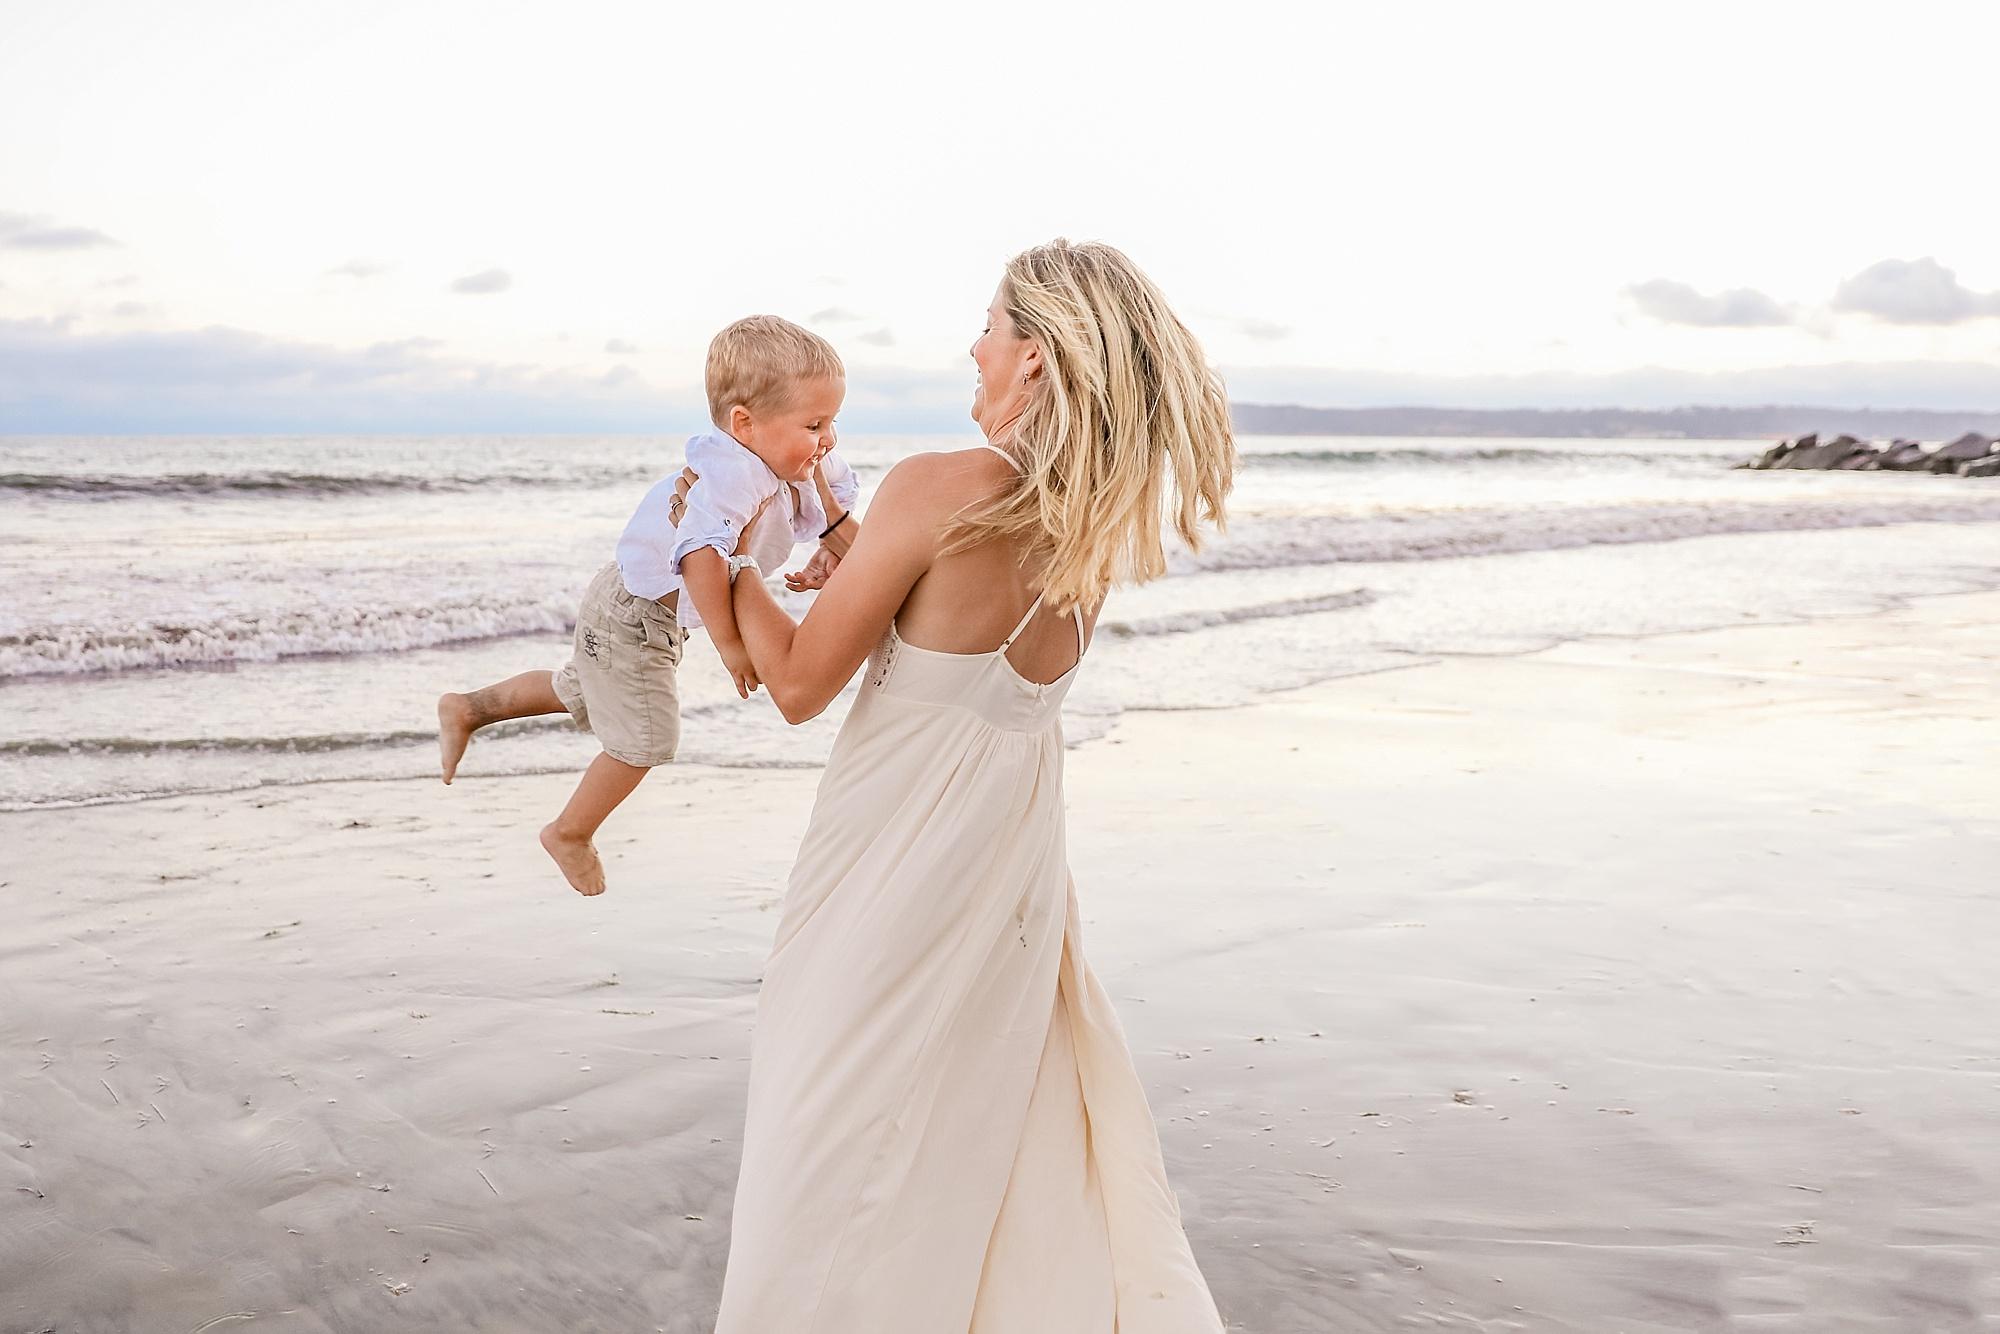 San Diego Family Photography | Hotel del Coronado Photographer